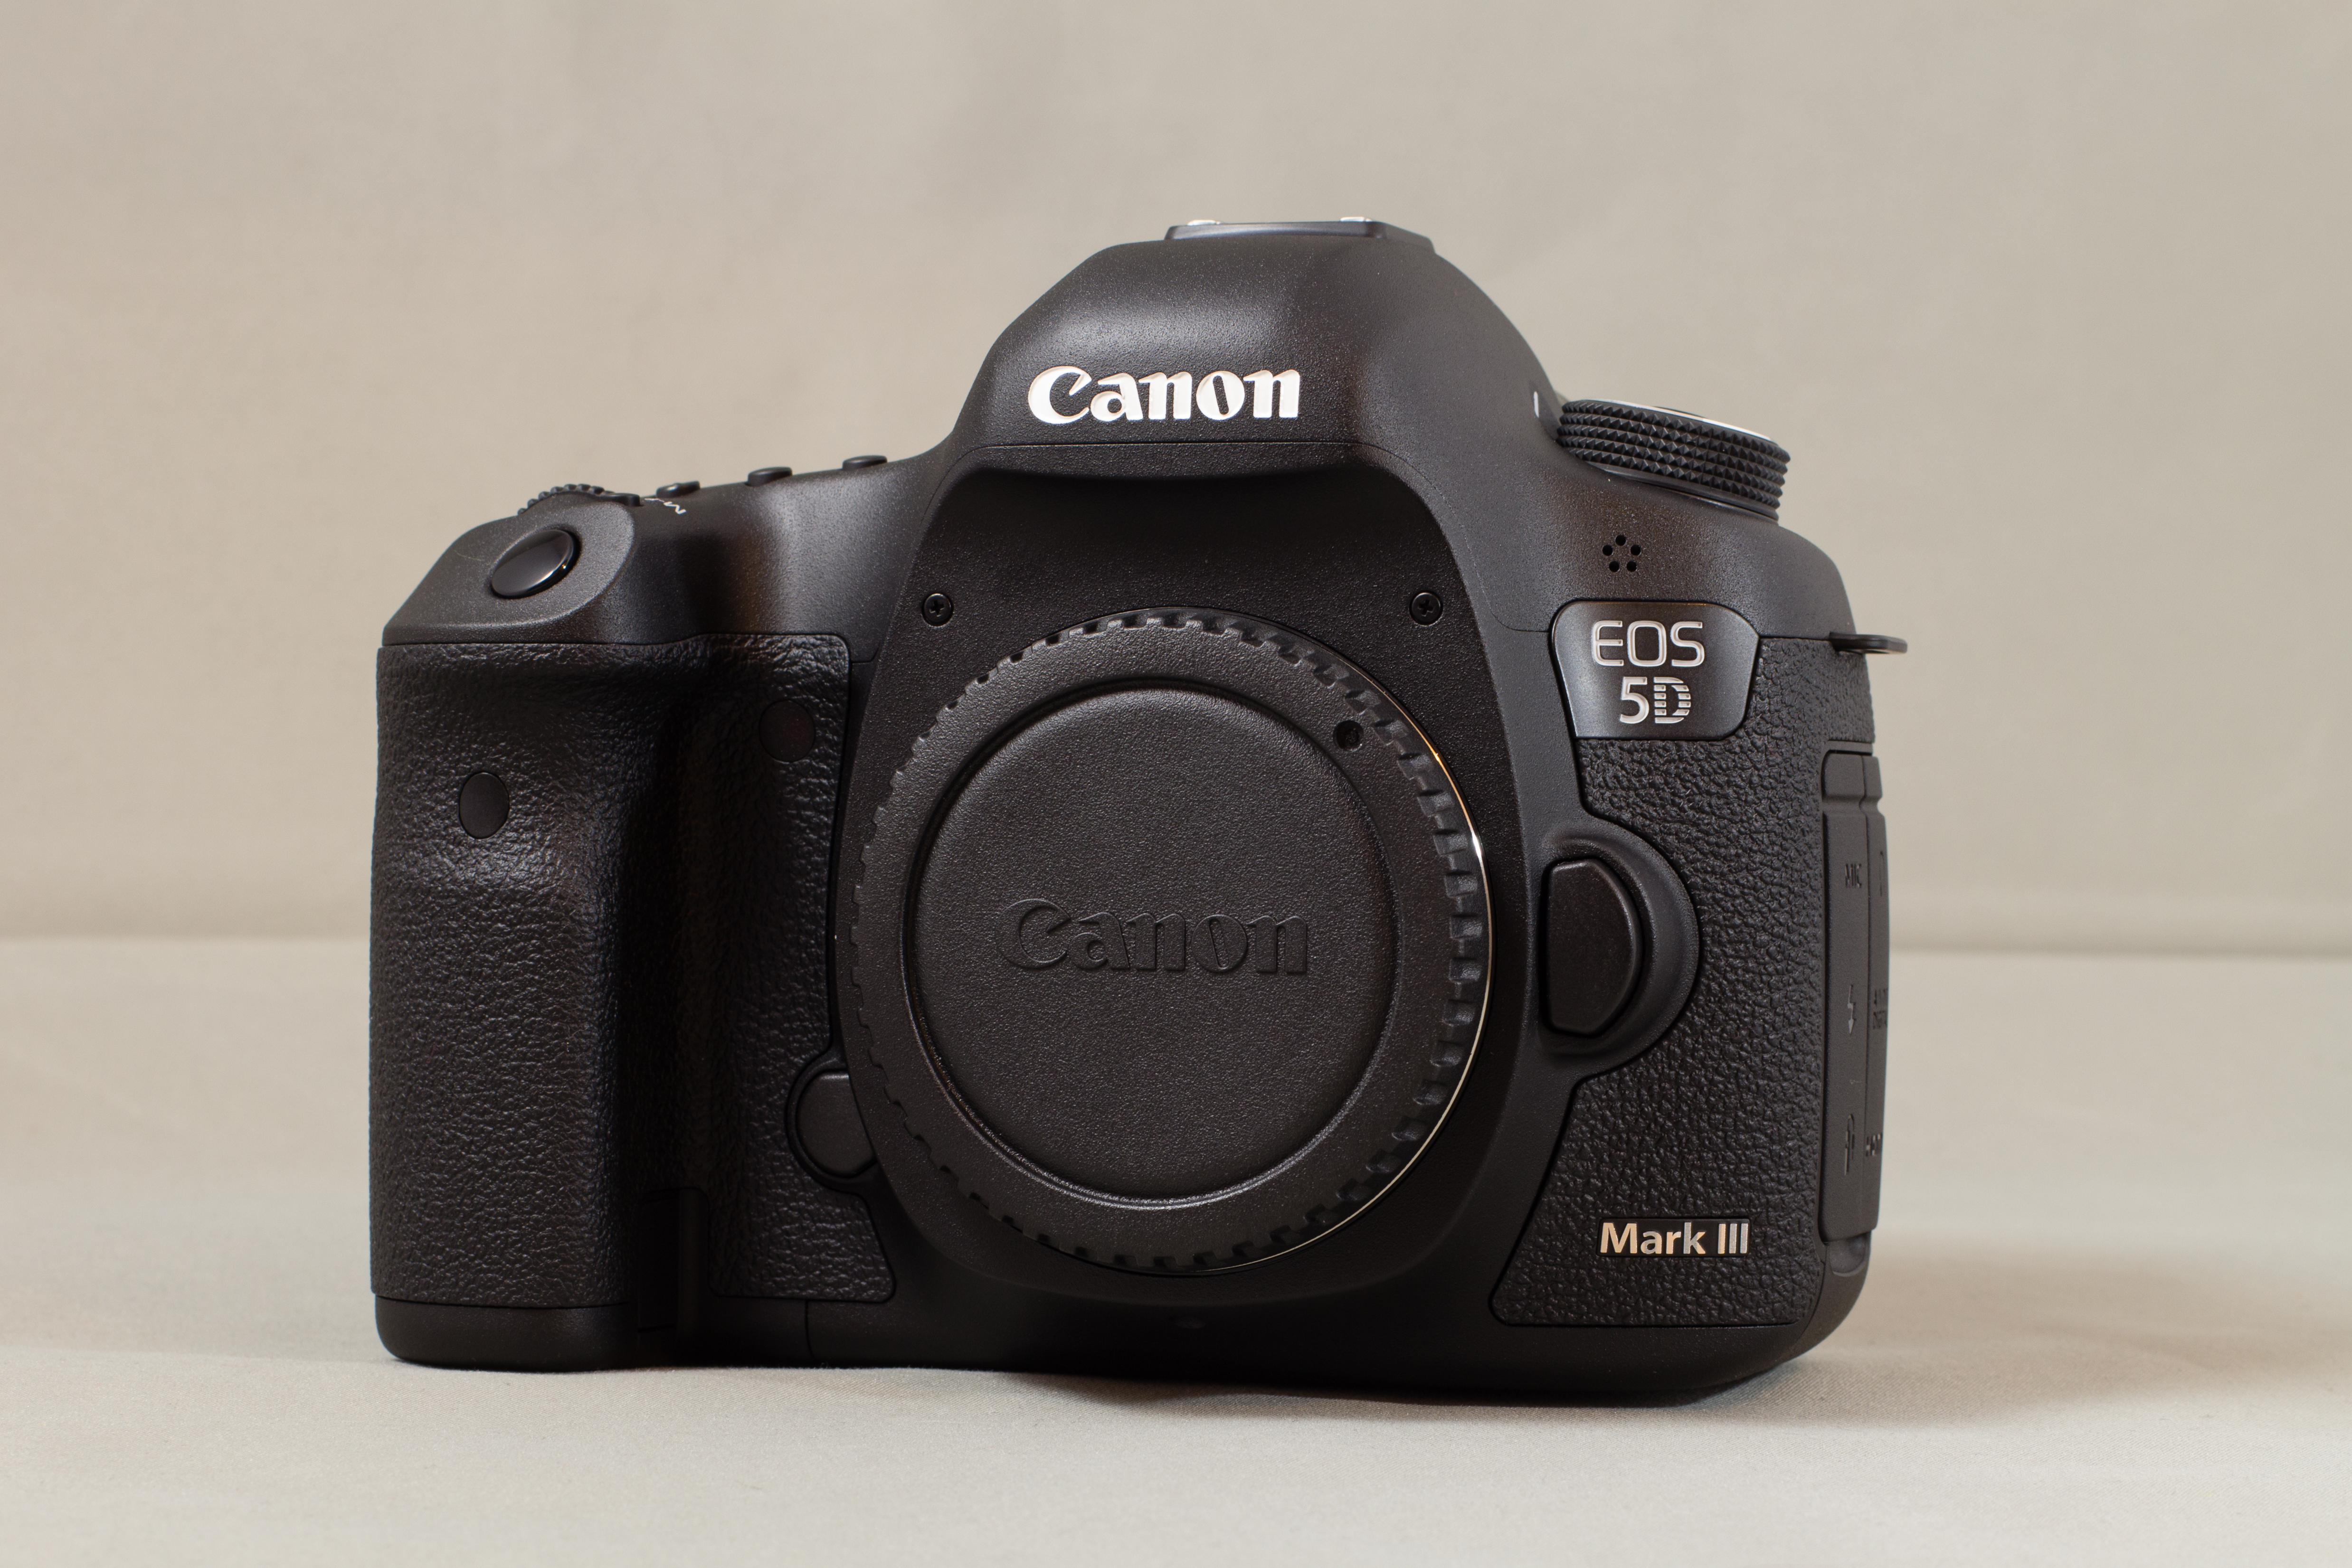 Canon EOS 5D Mark III - Wikipedia